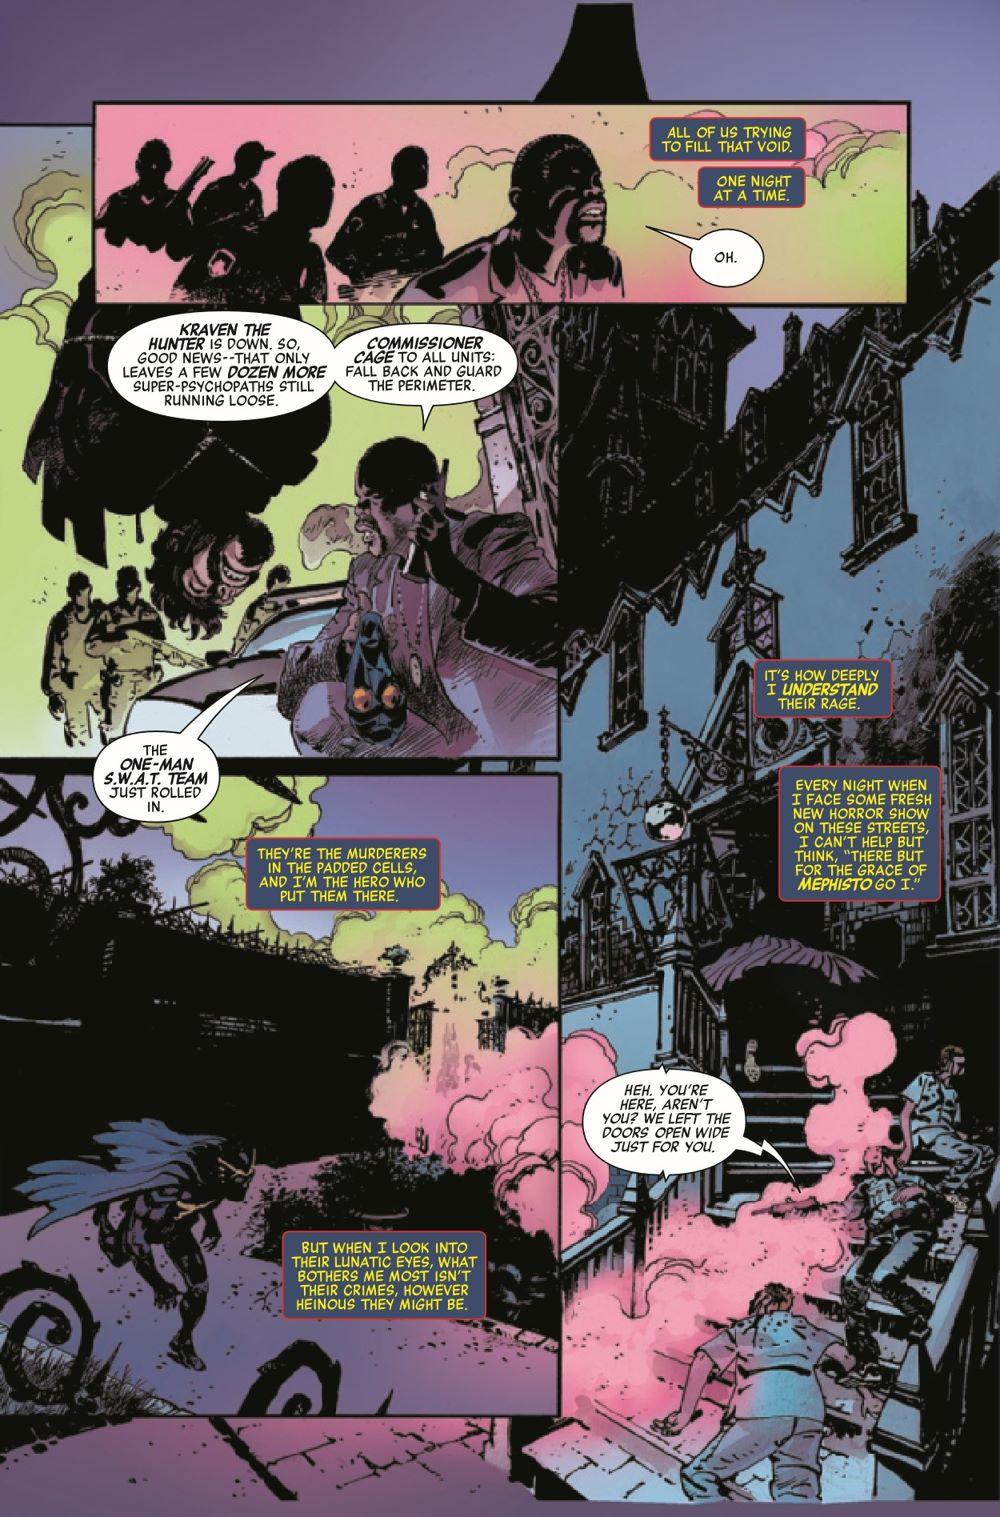 HEROESREBORN2021005_Preview-5 ComicList Previews: HEROES REBORN #5 (OF 7)